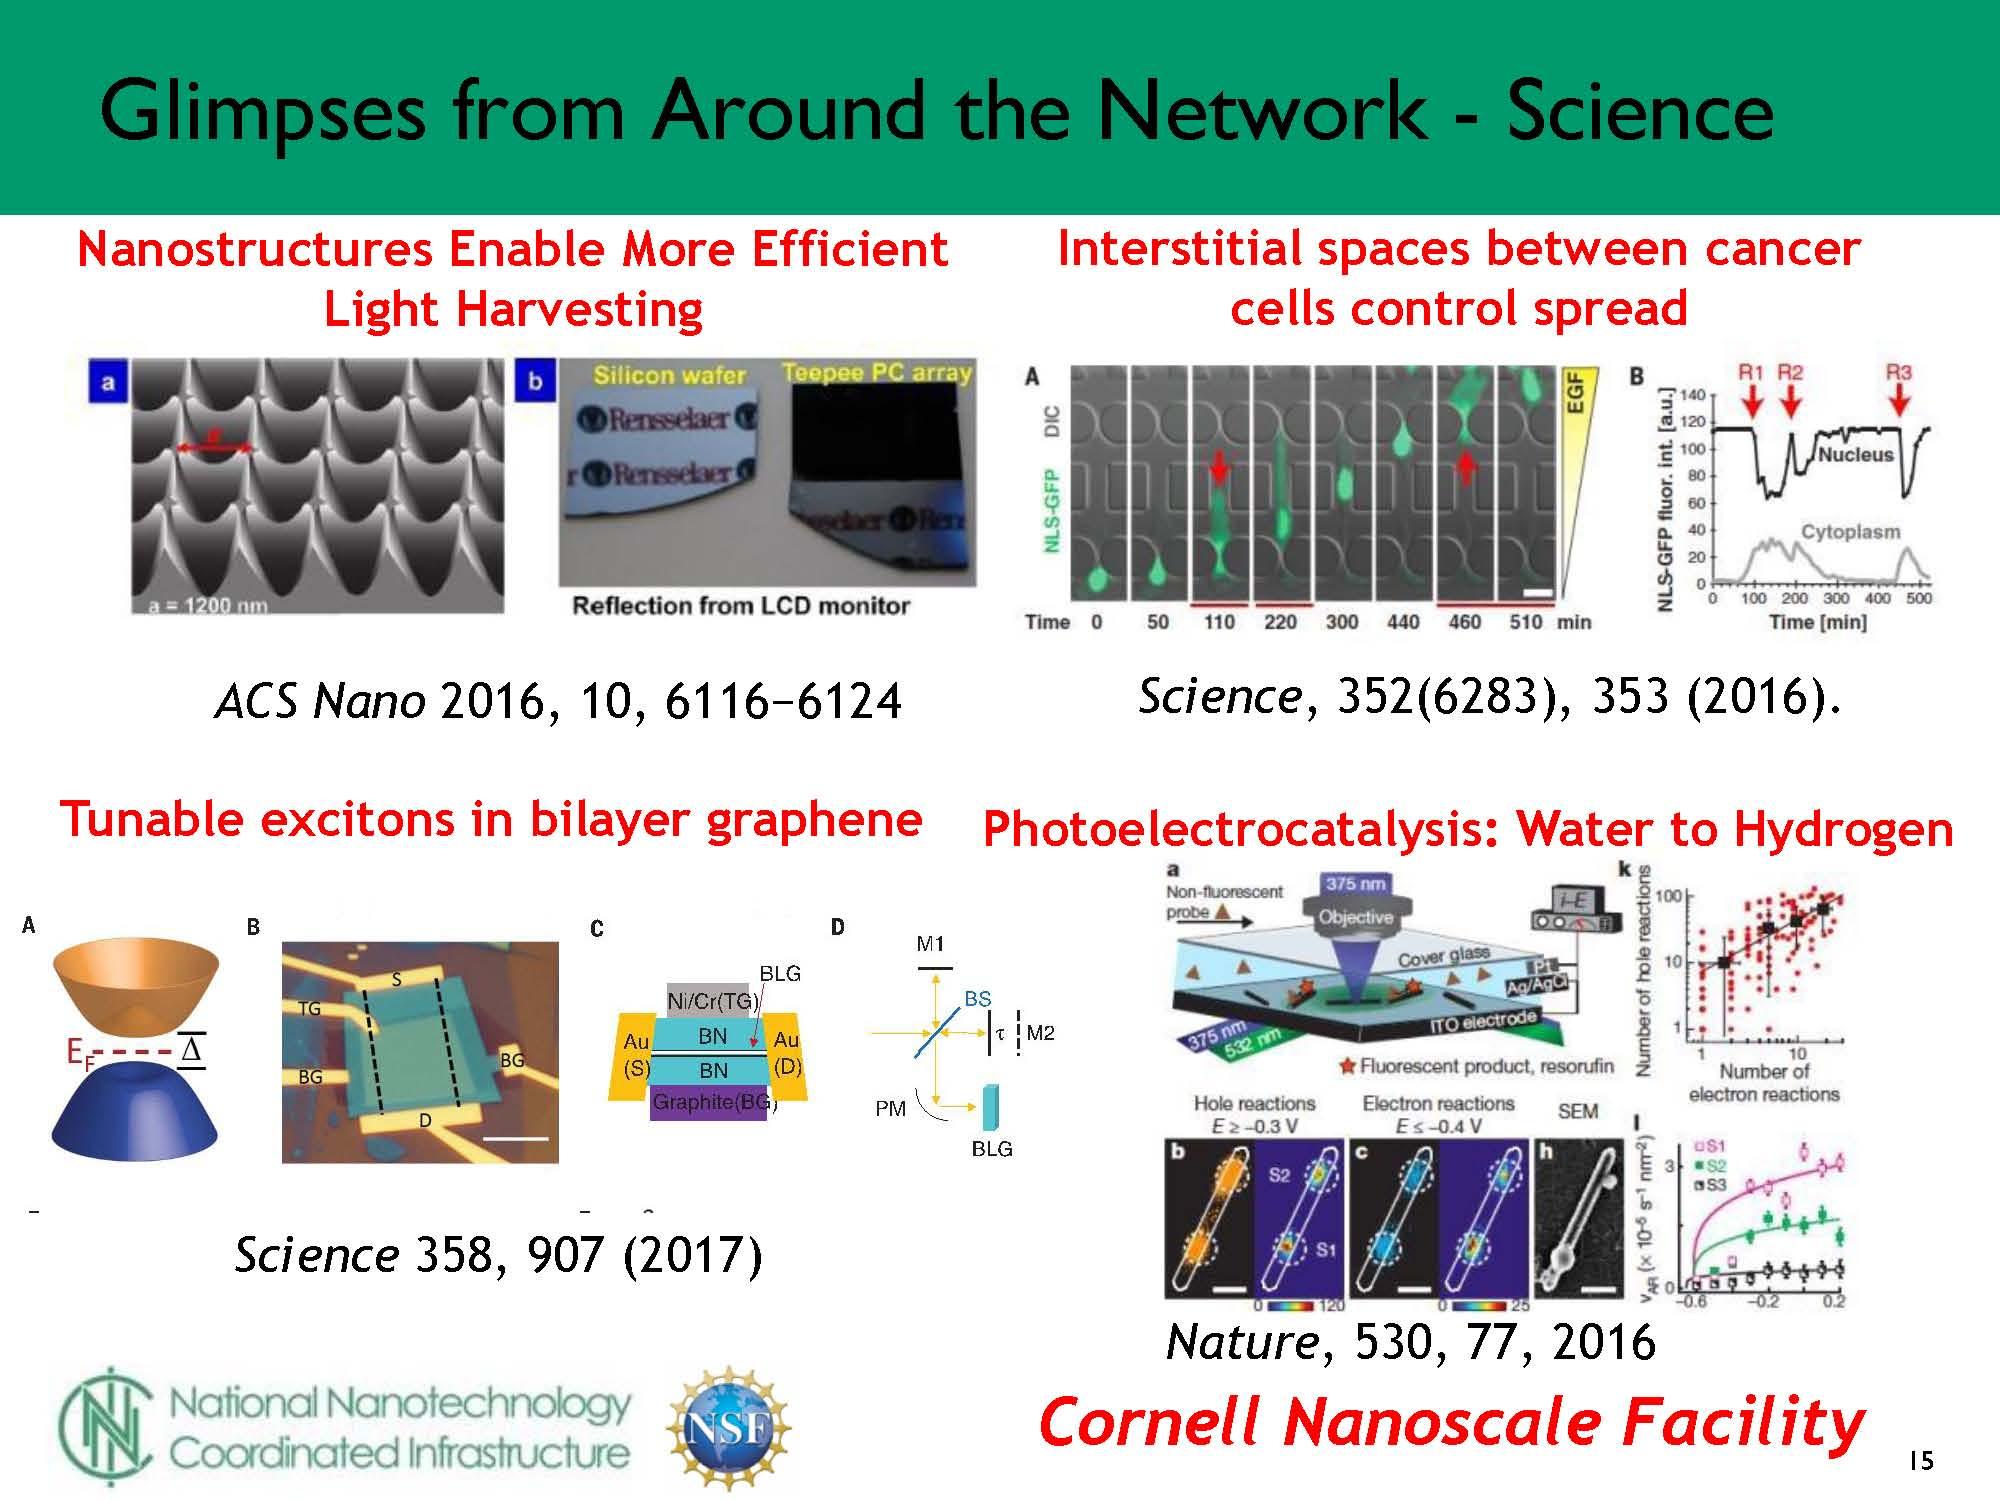 NSF 2017 NanoscienceGrantees Conf - NNCI presentation by Mark Allen_Page_15.jpg